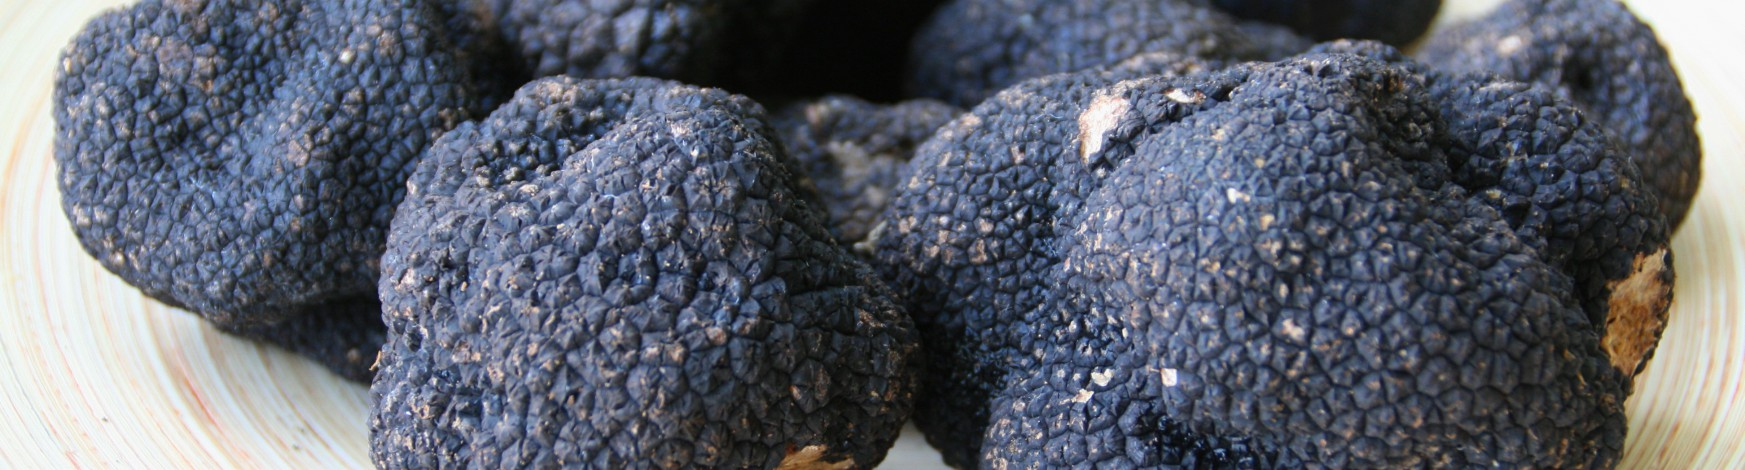 black-truffle.